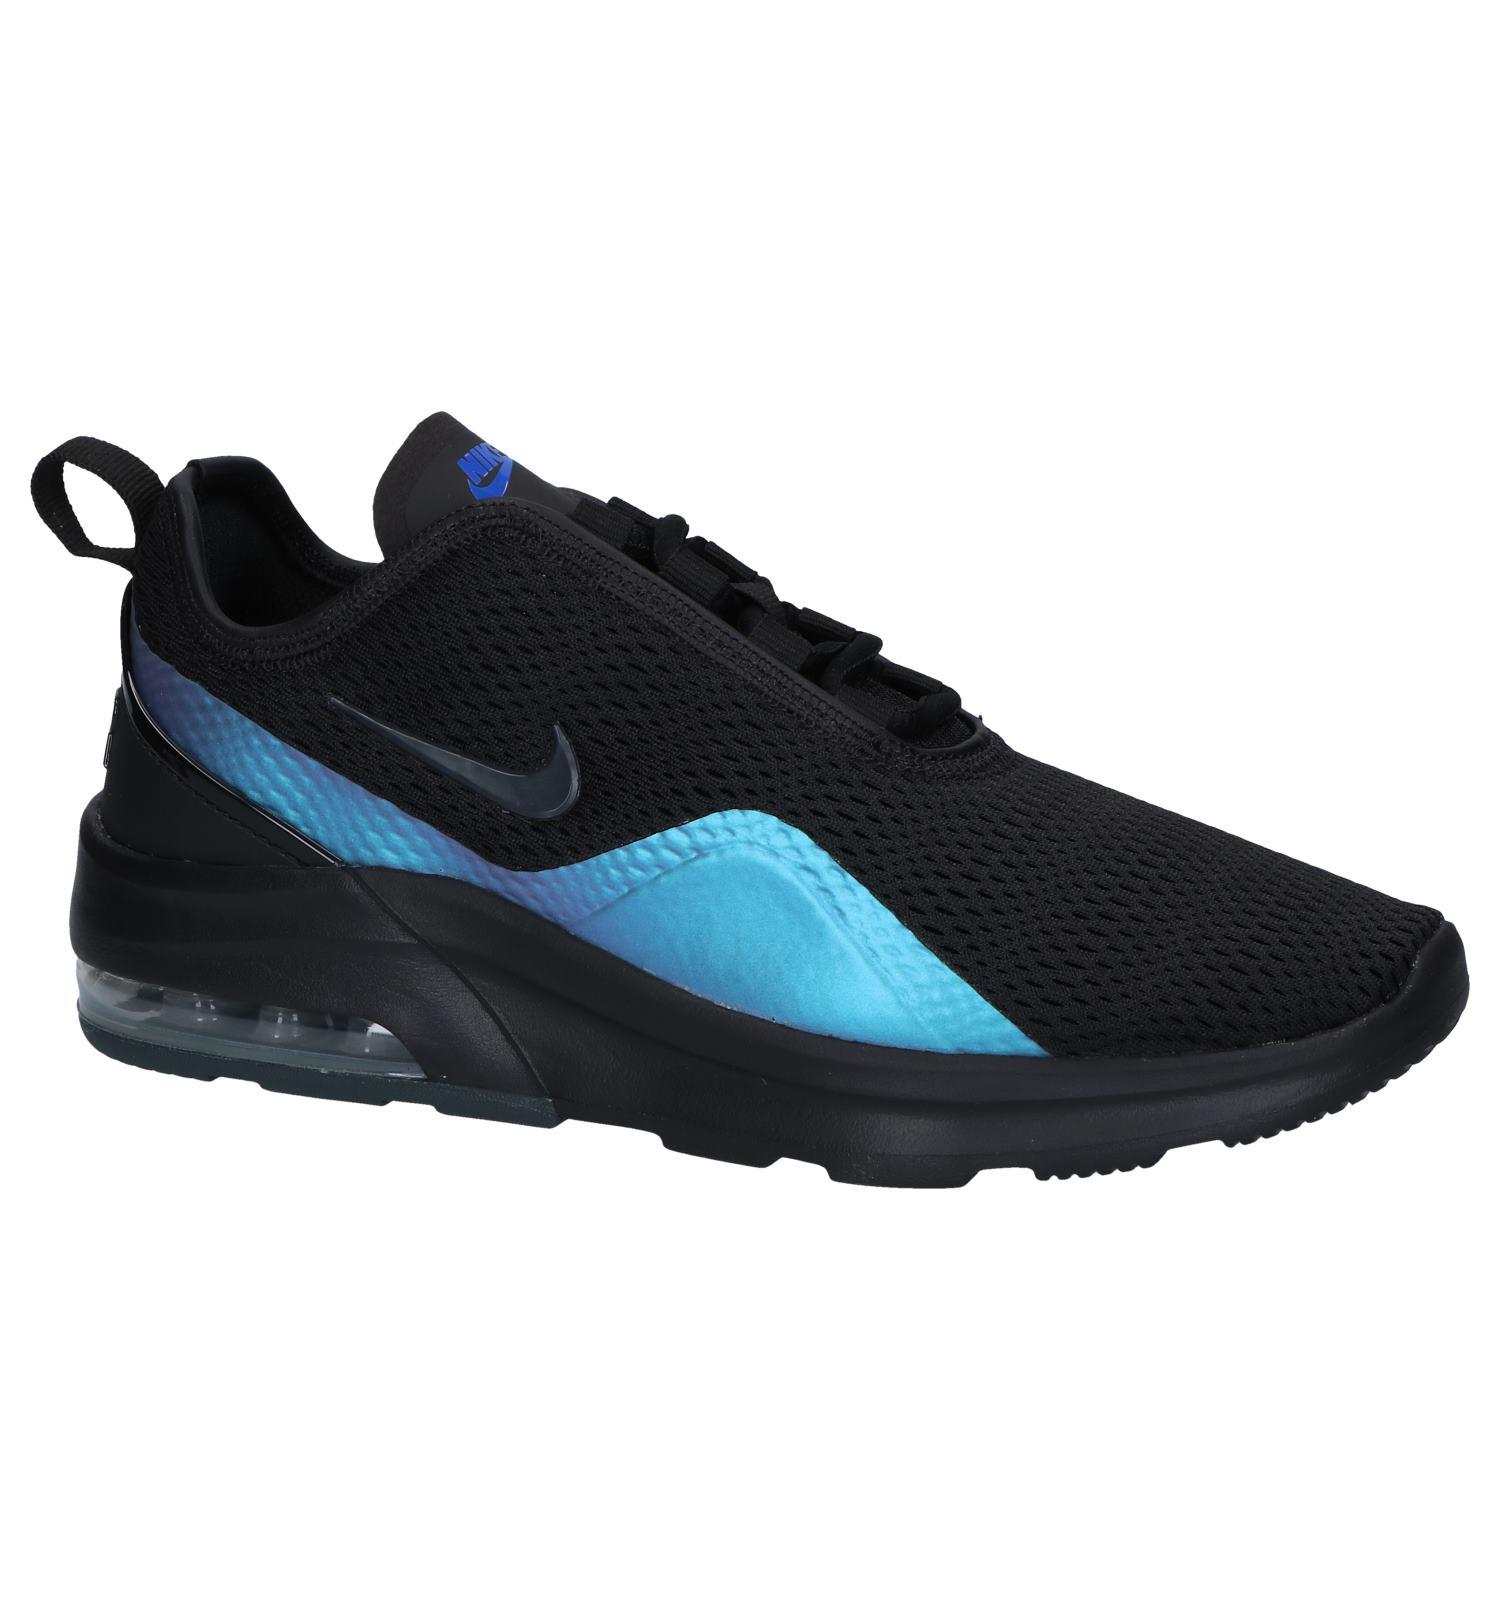 5be0d05134b Zwarte Sneakers Nike Air Max Motion 2 | TORFS.BE | Gratis verzend en retour